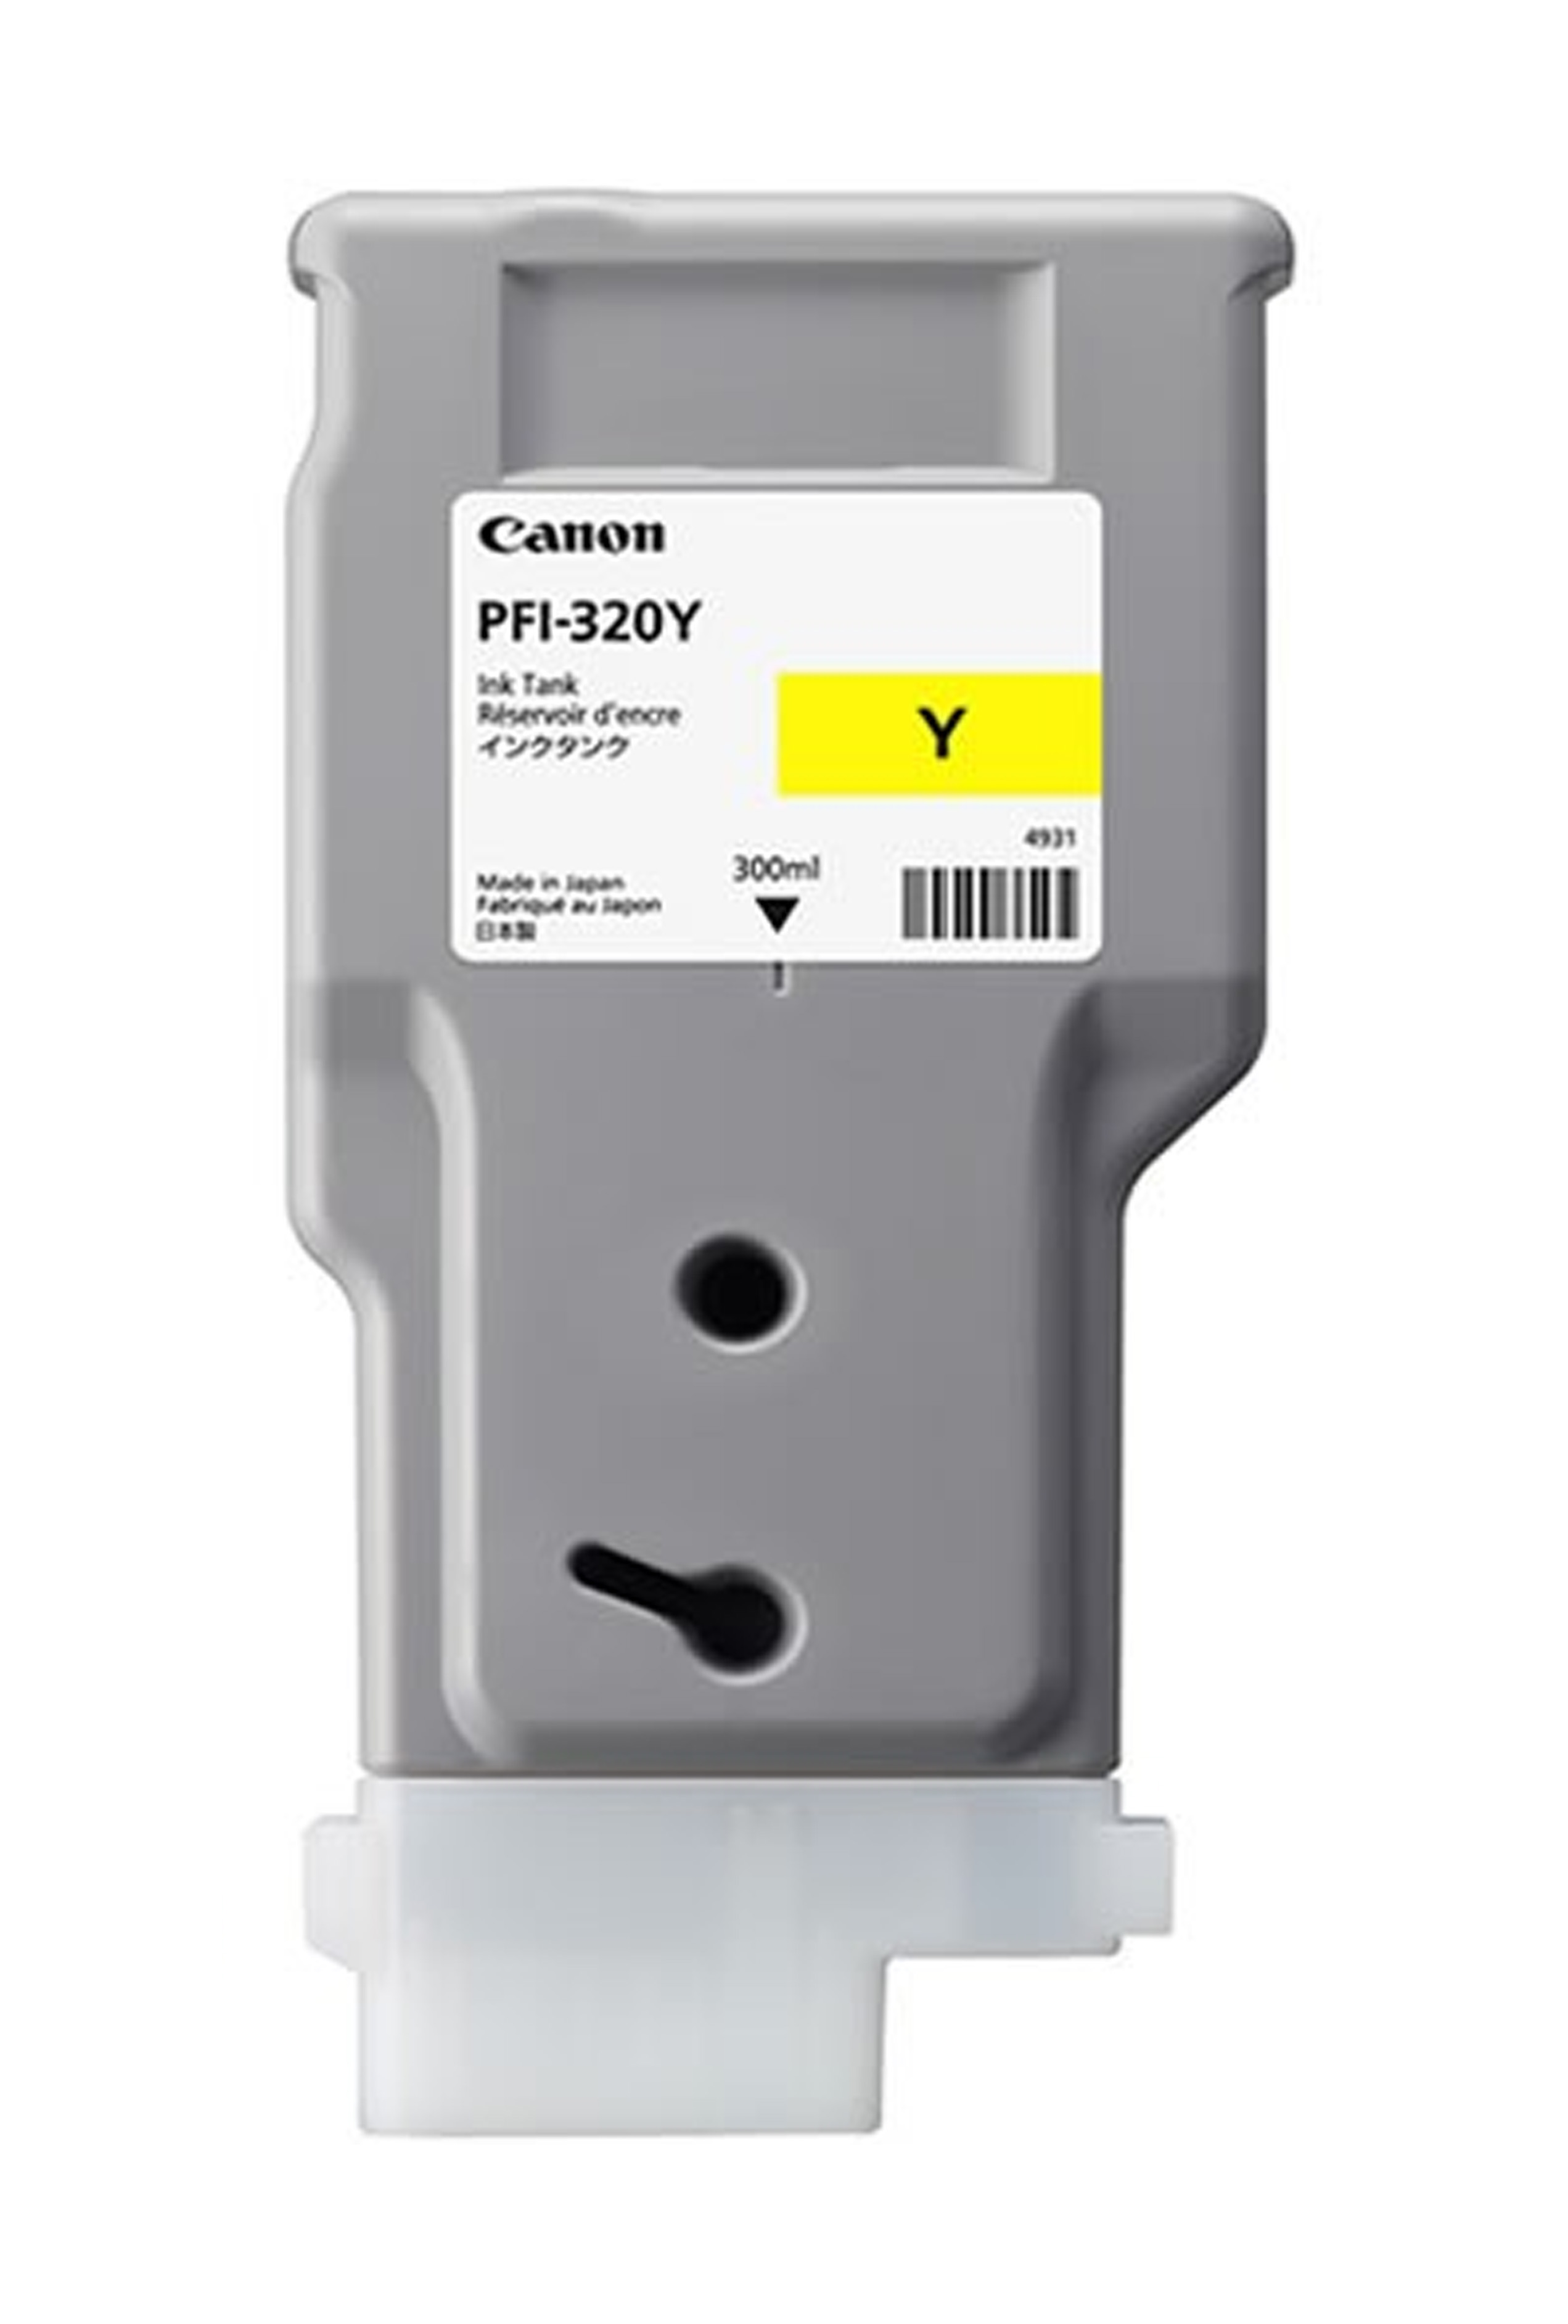 Canon Ink tank PFI-320Y Pigment Ink Tank 300ml (2893C001AA)